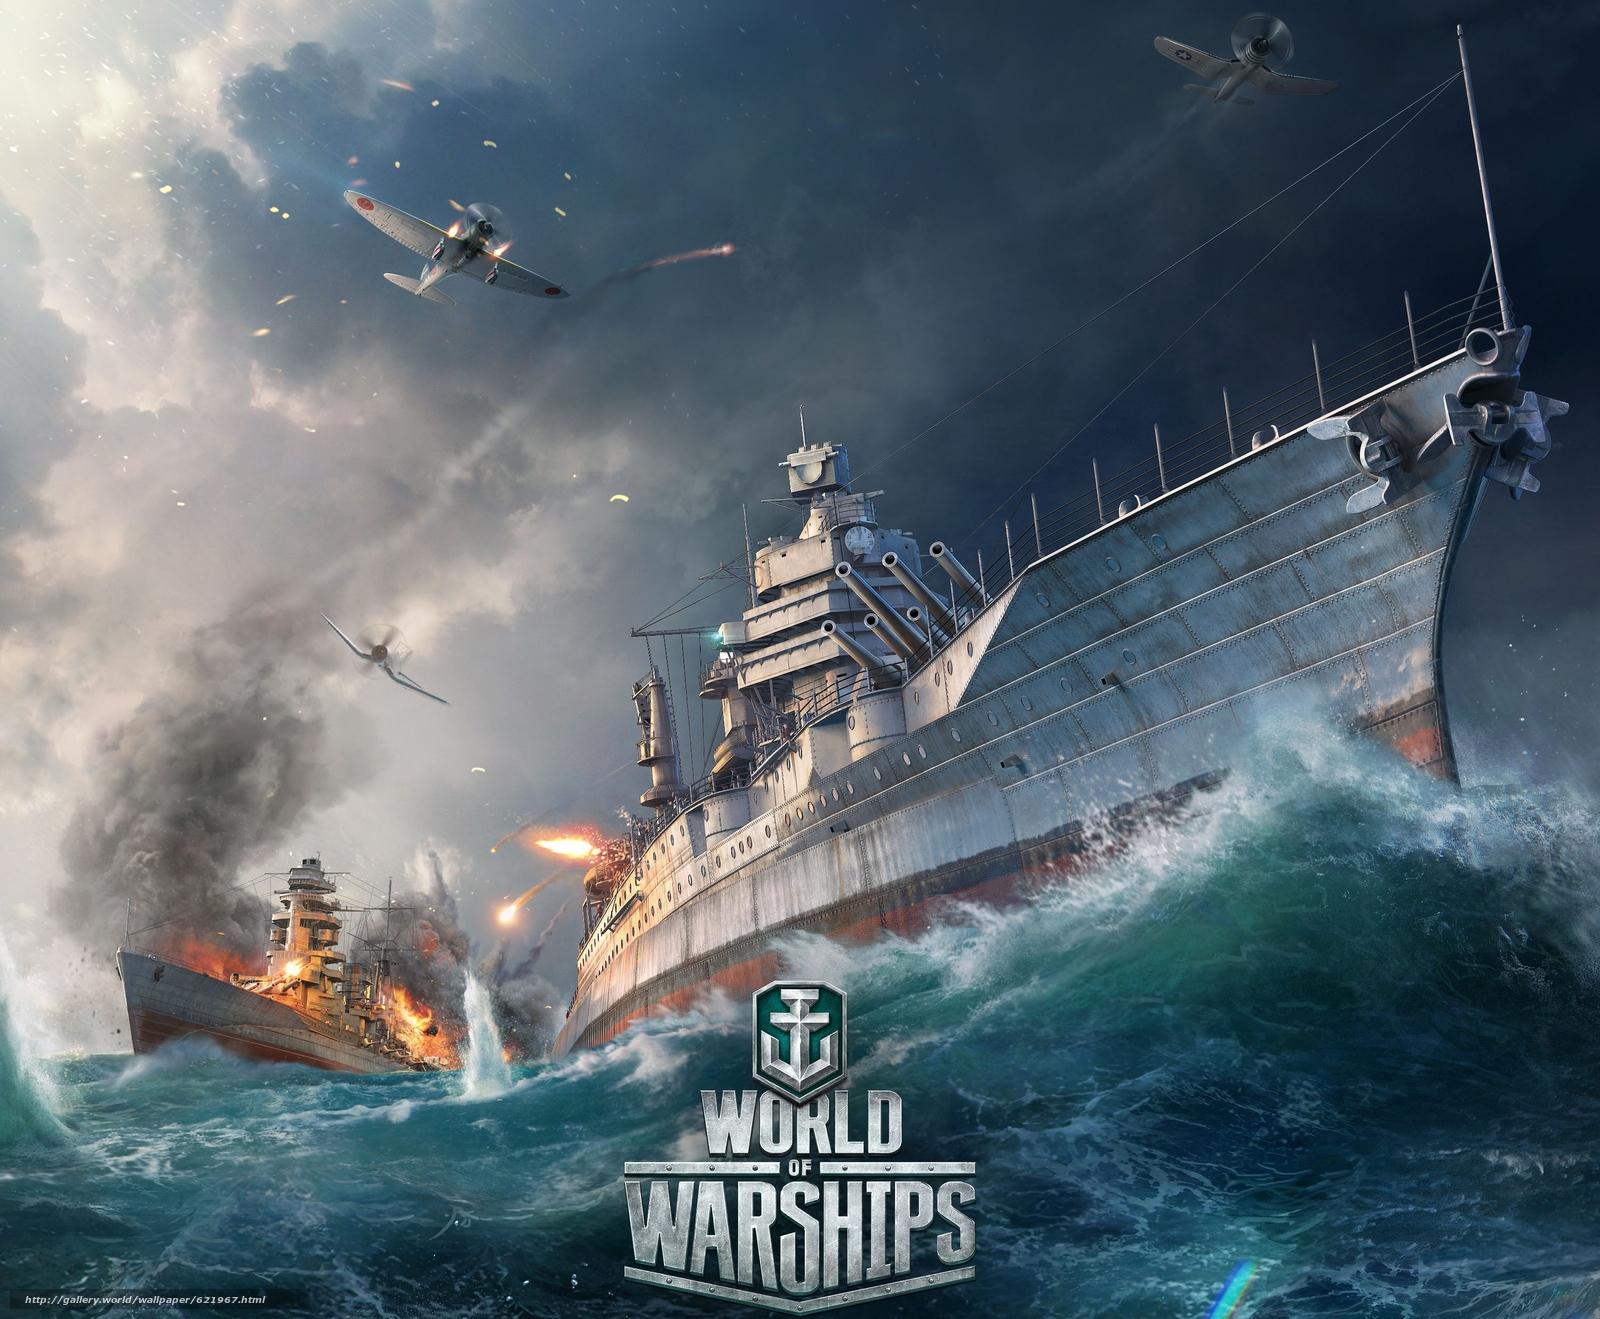 World of Warships, Мир Кораблей, морской бой